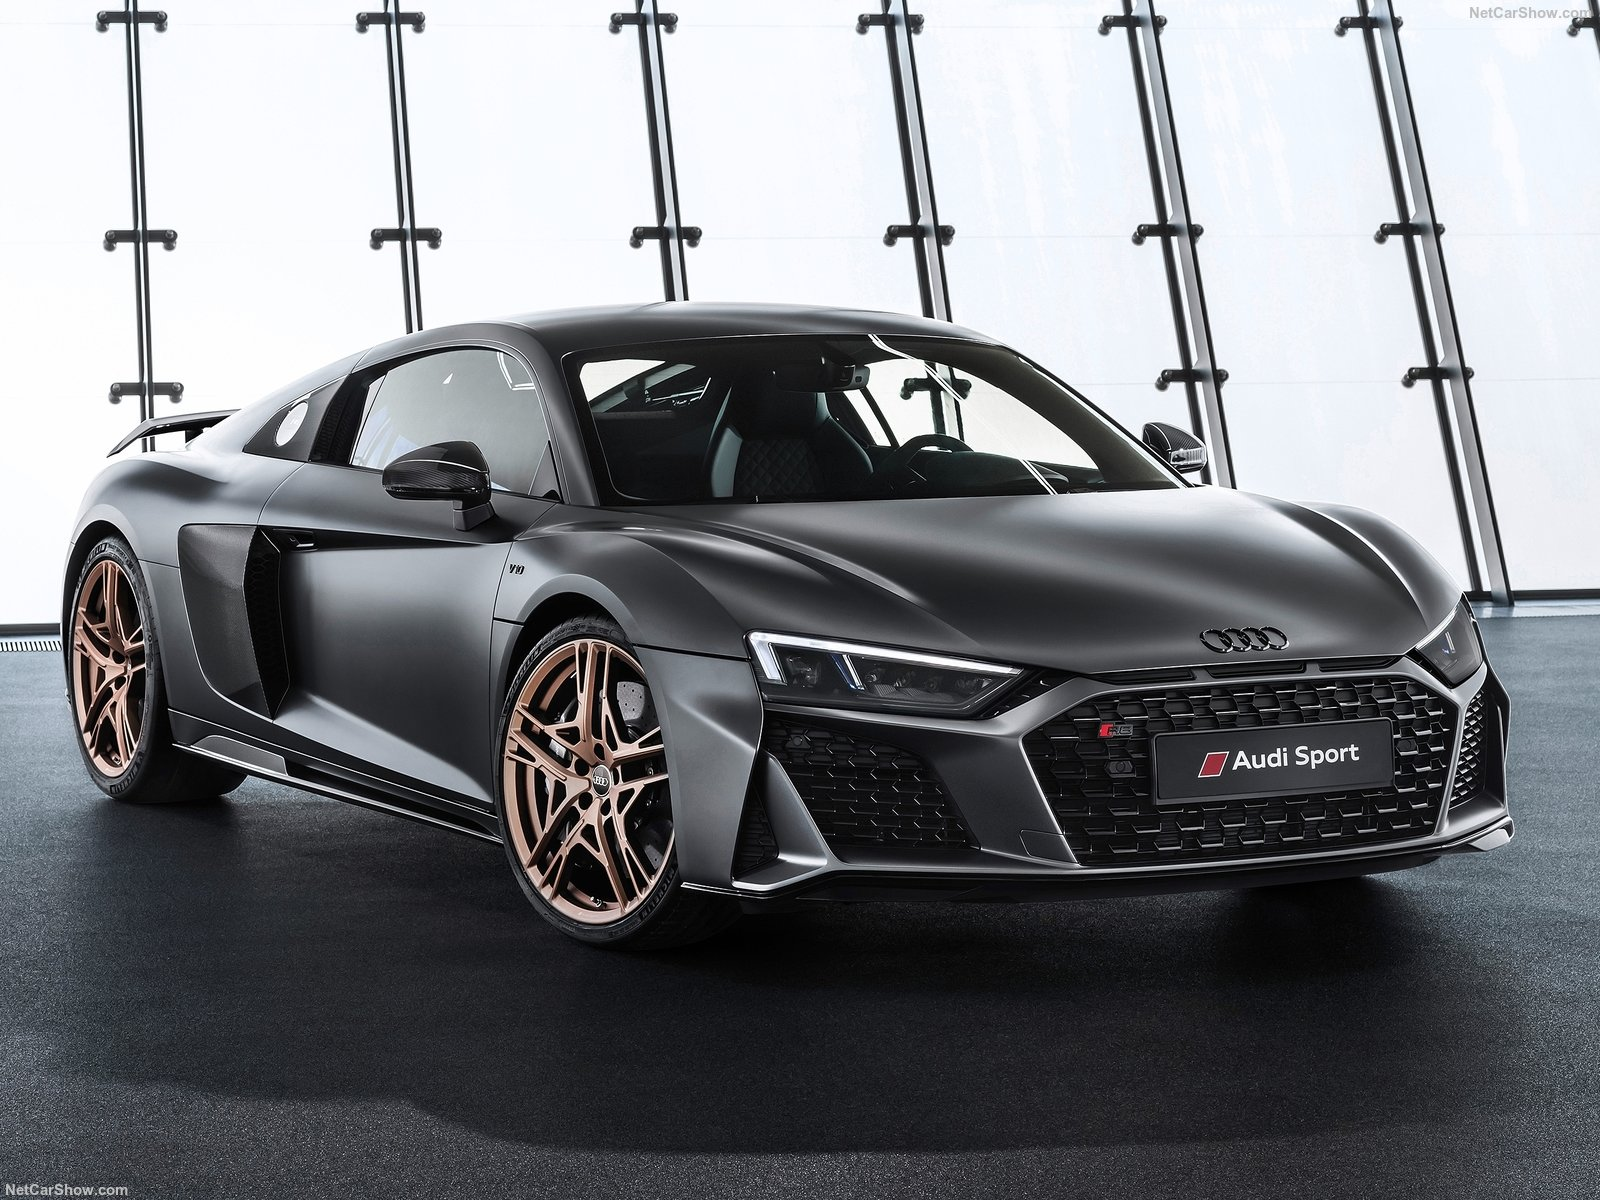 R8要退休了,奥迪史上最强电动跑车RS e-tron 或在2023亮相